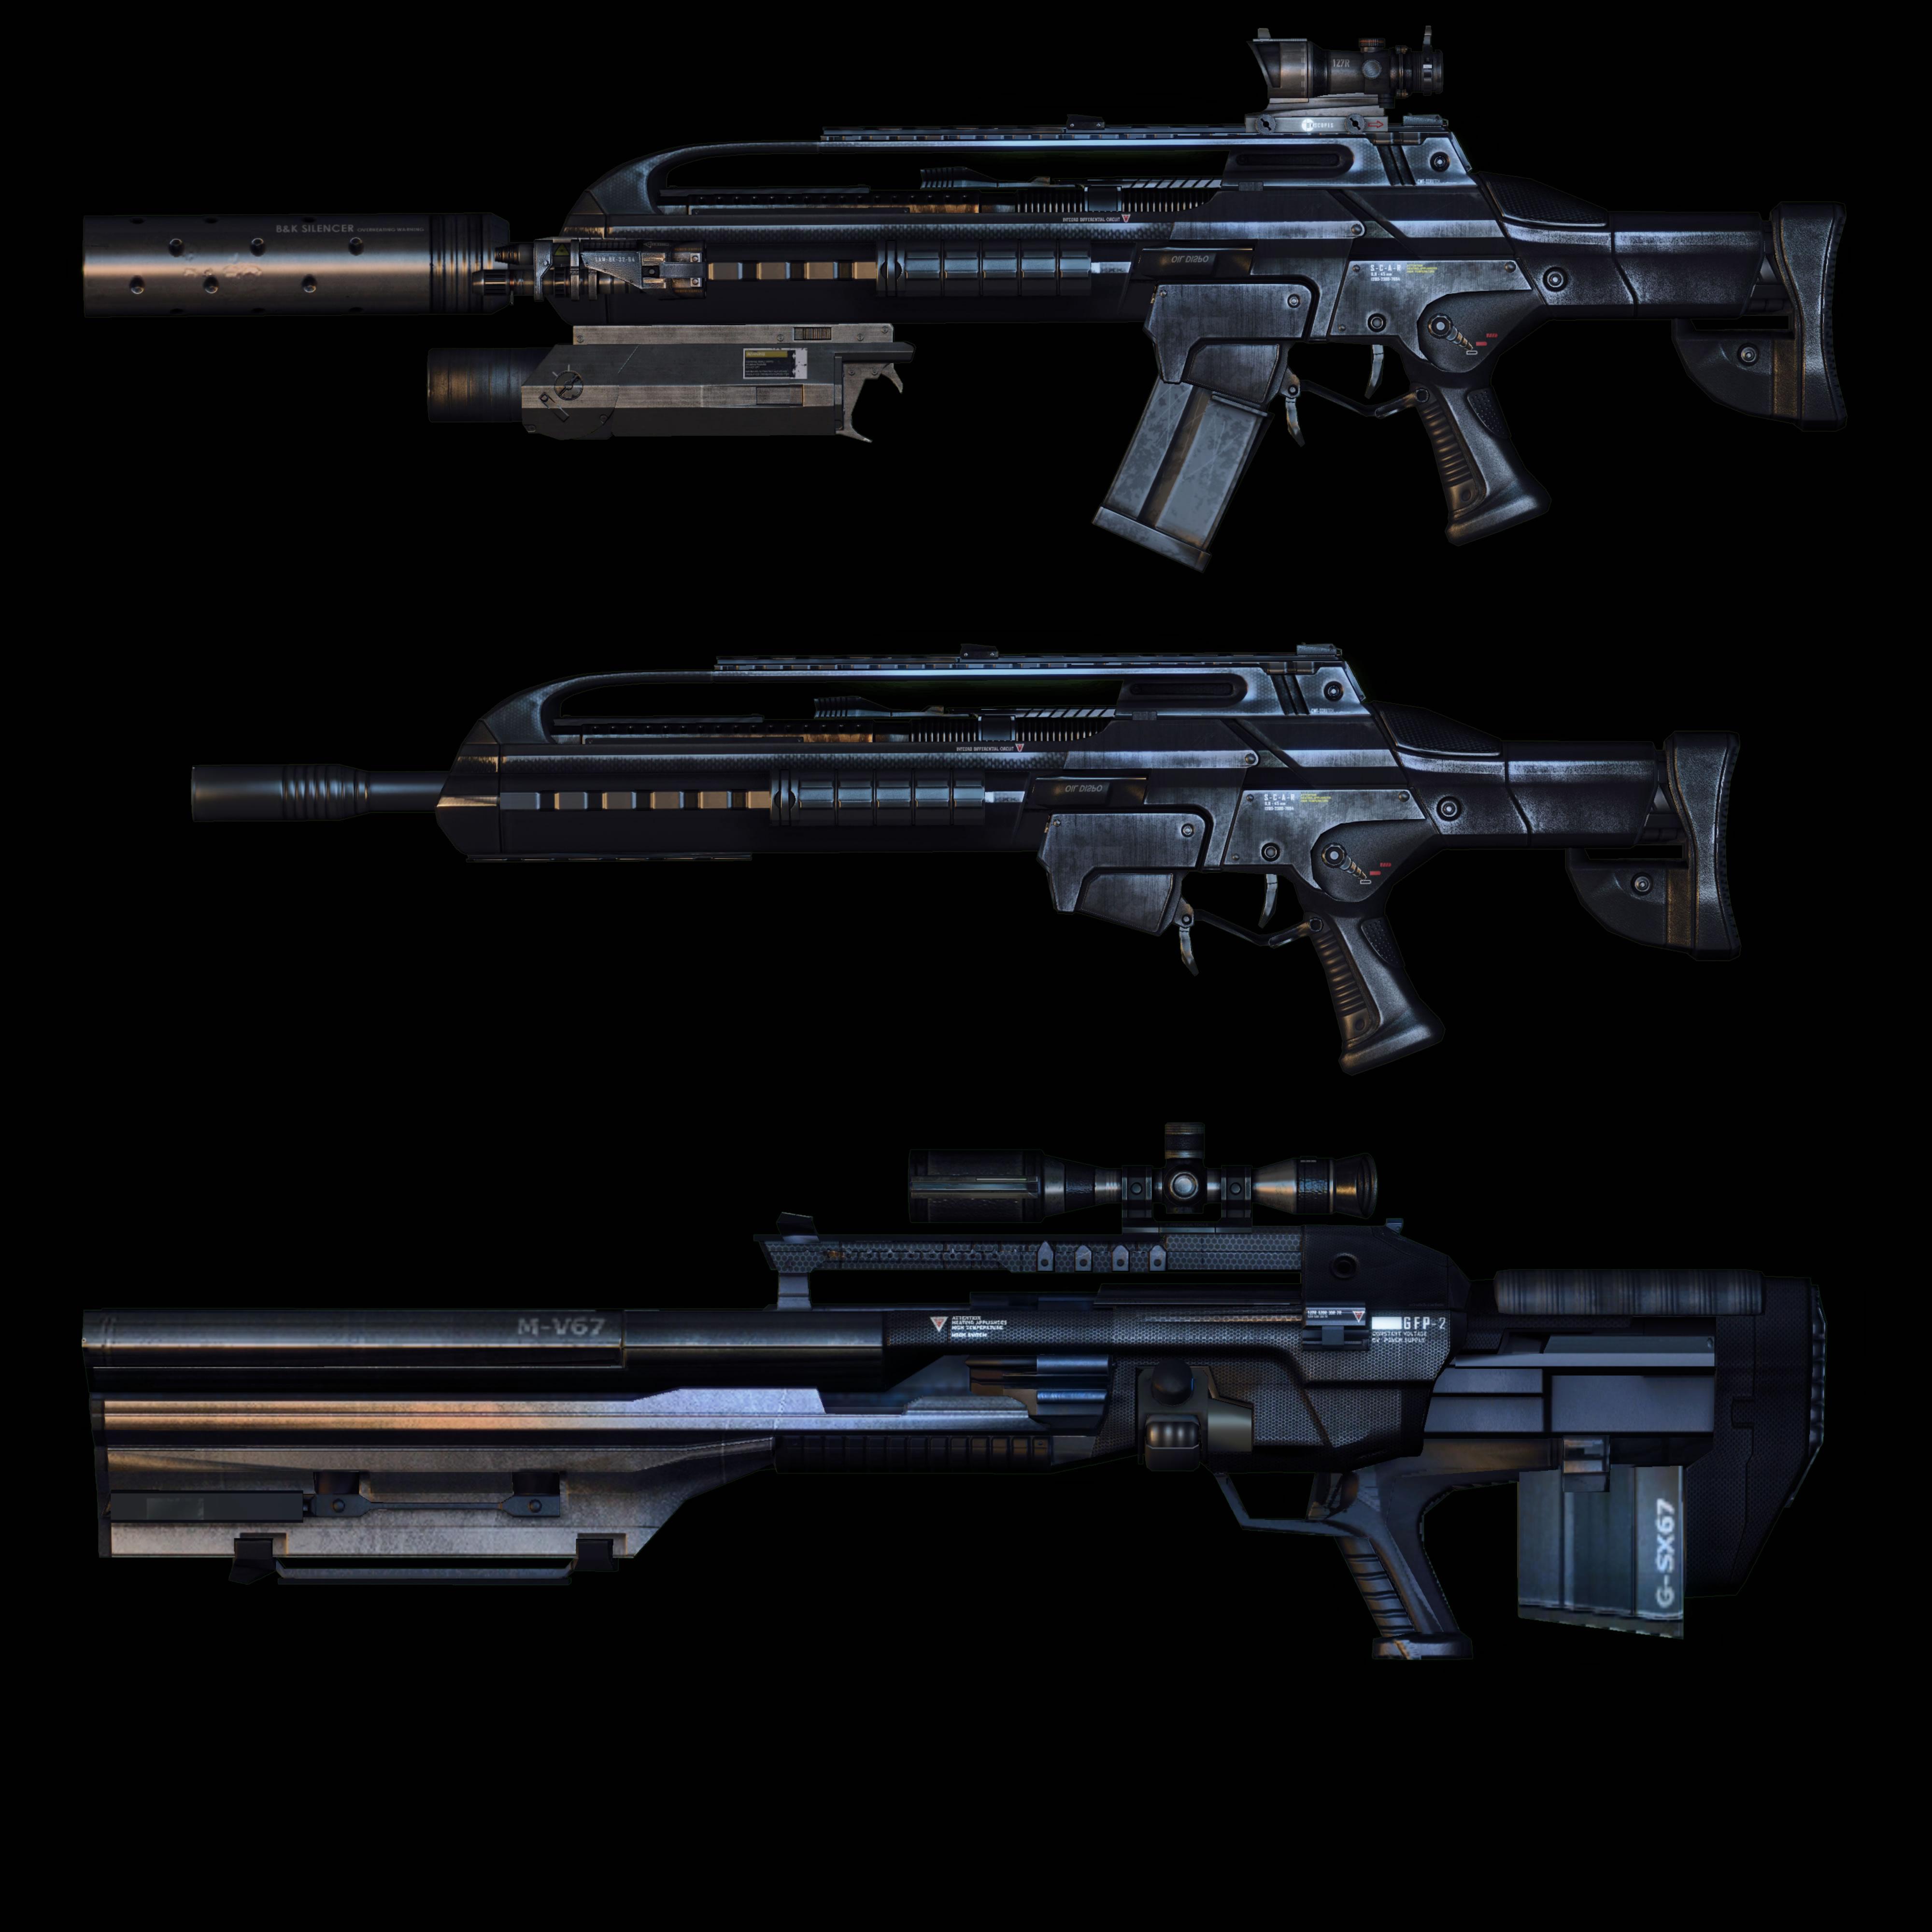 weapon-1.jpg